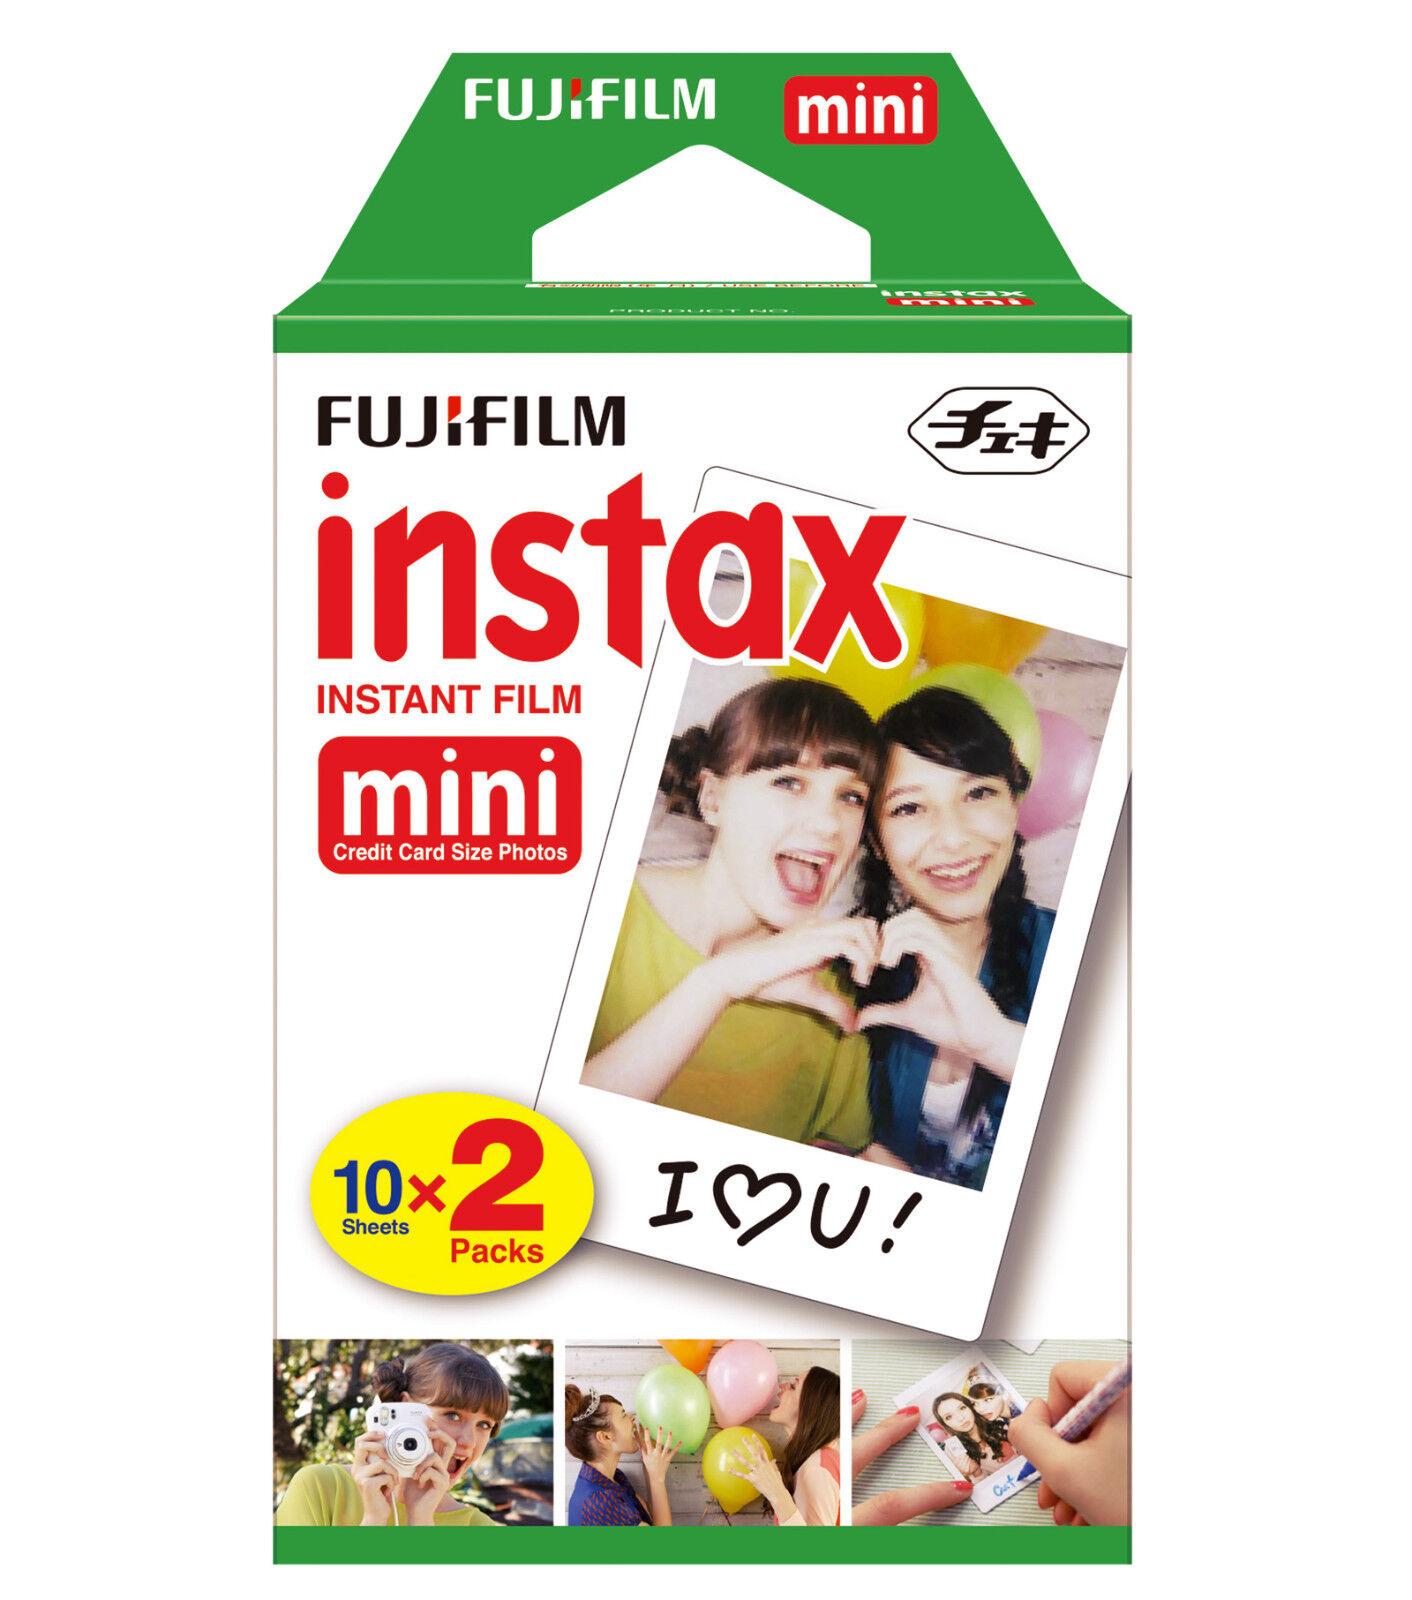 Fujifilm Instax Mini Instant Film Twin Pack for Fuji 50s 25 7s 90 8 & 9 Exp.7/18